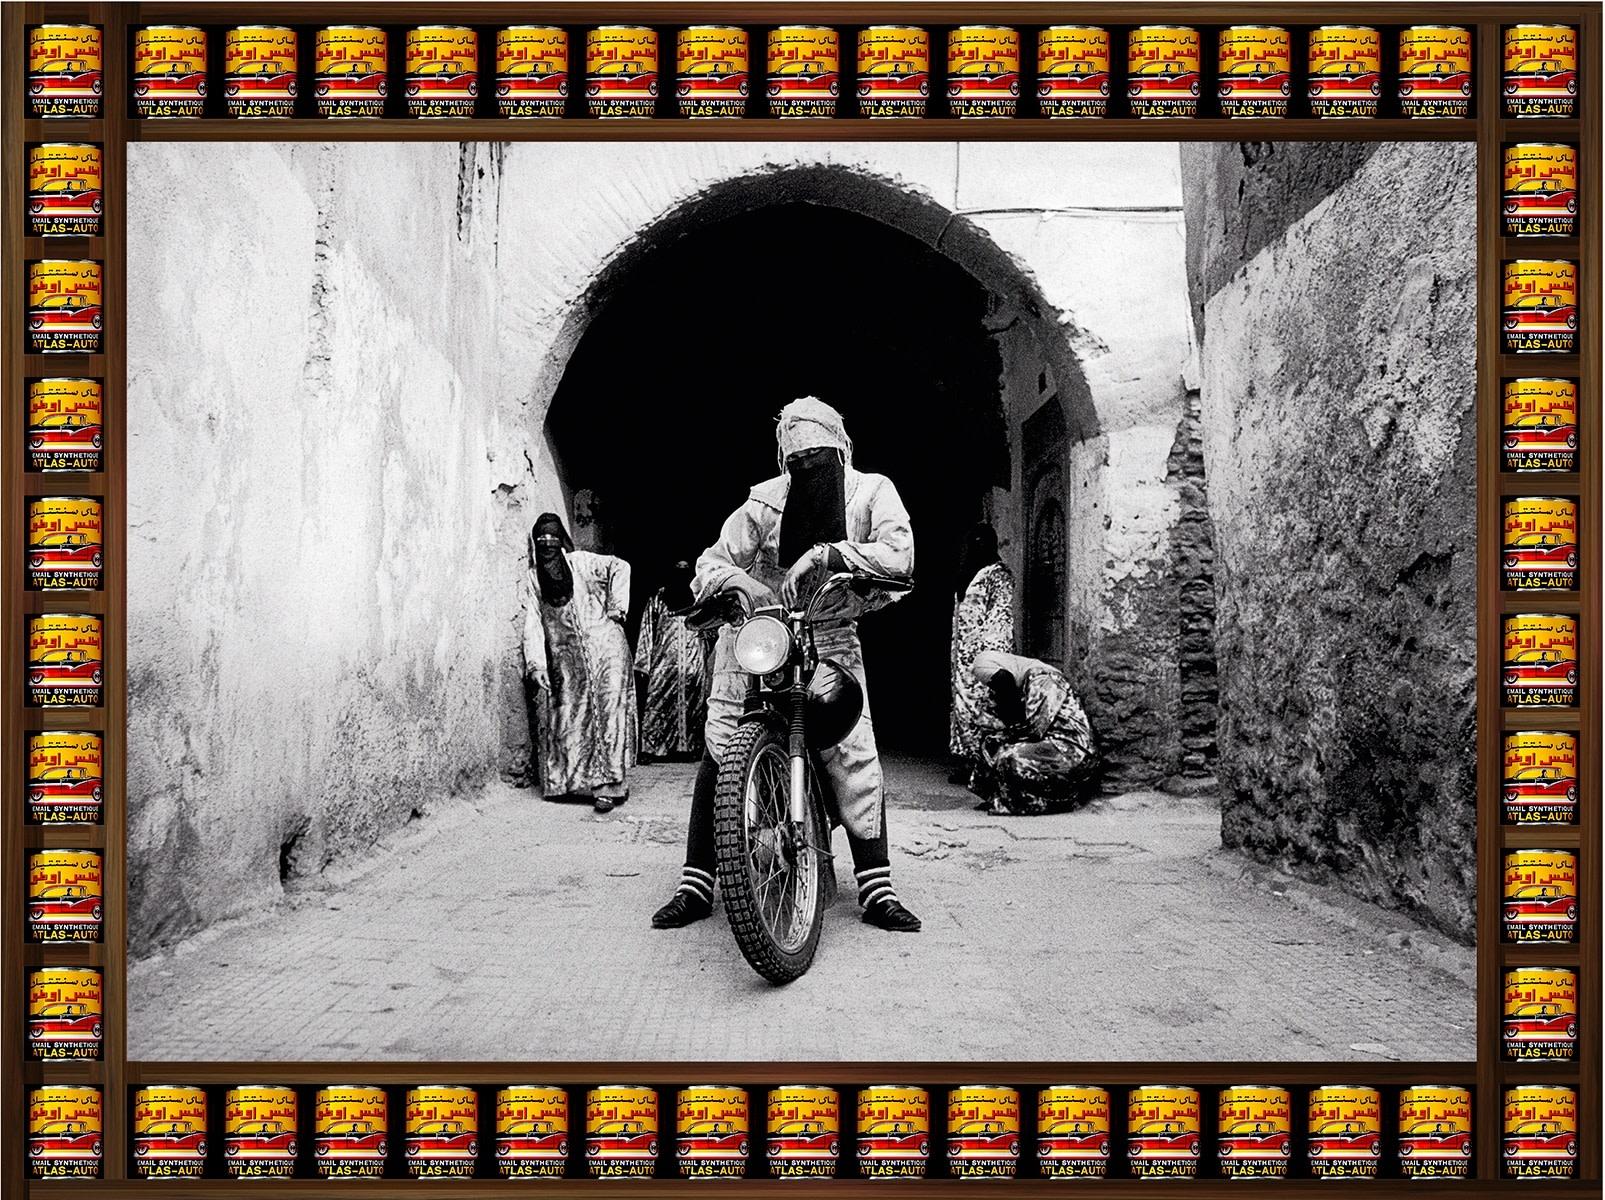 Hassan Hajjaj, Henna Crew, 2010/1431